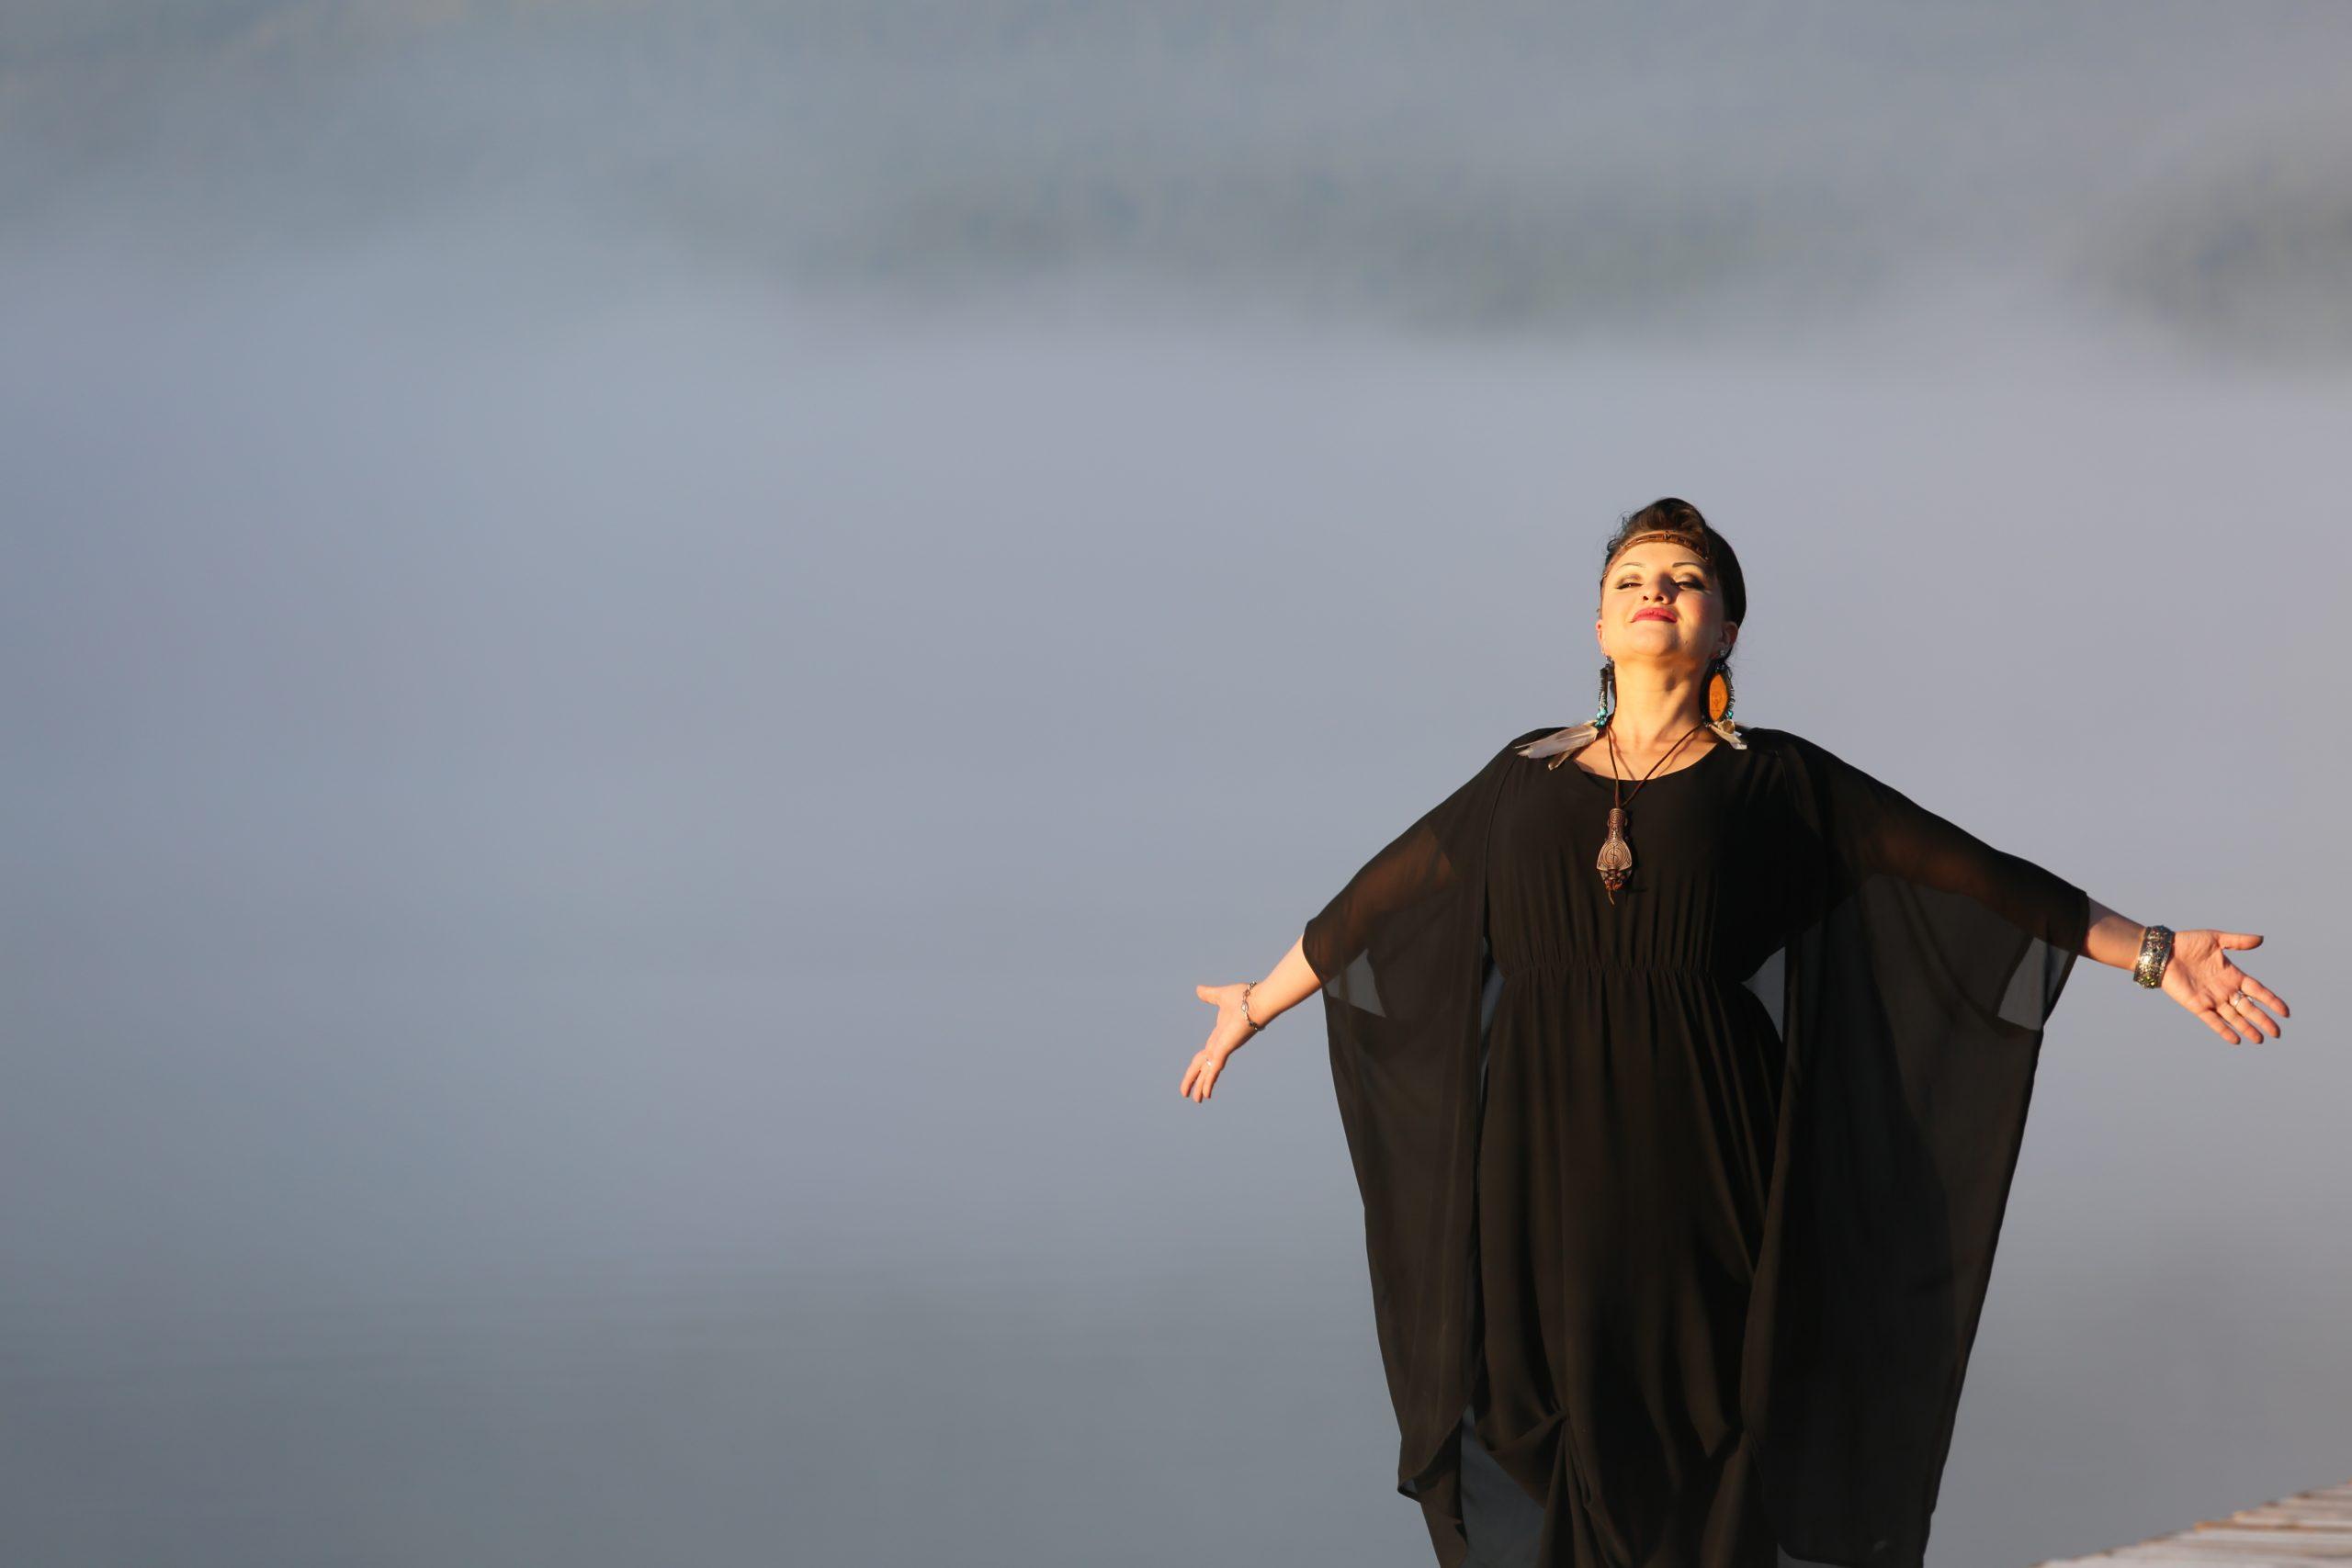 Shakuntali Siberia opens up the magic of Indo-Tibetan healing